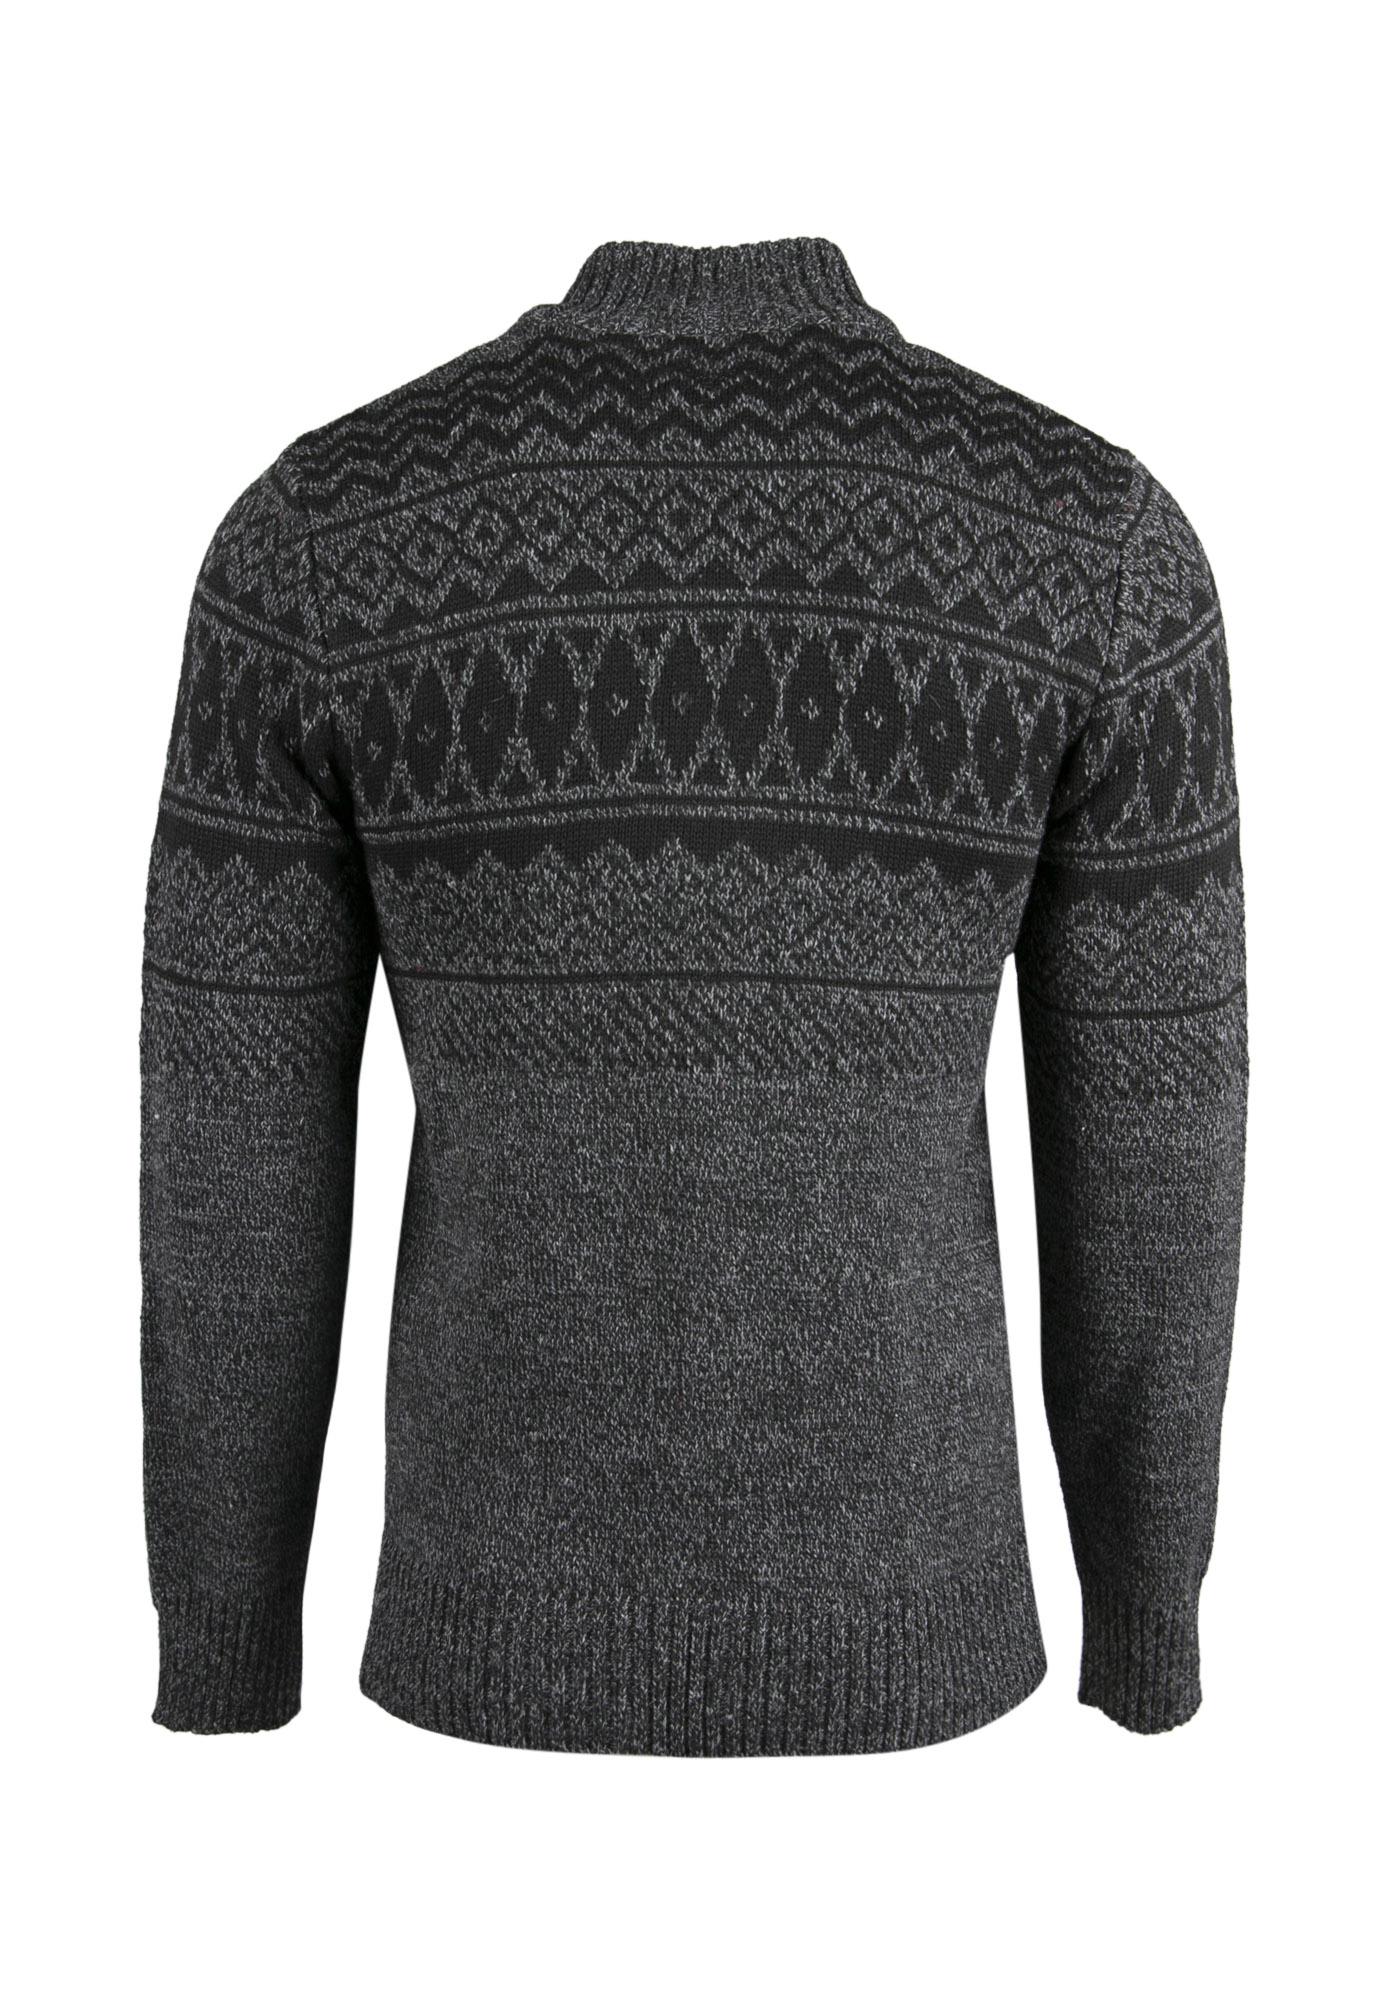 Men's Nordic Cardigan | Warehouse One